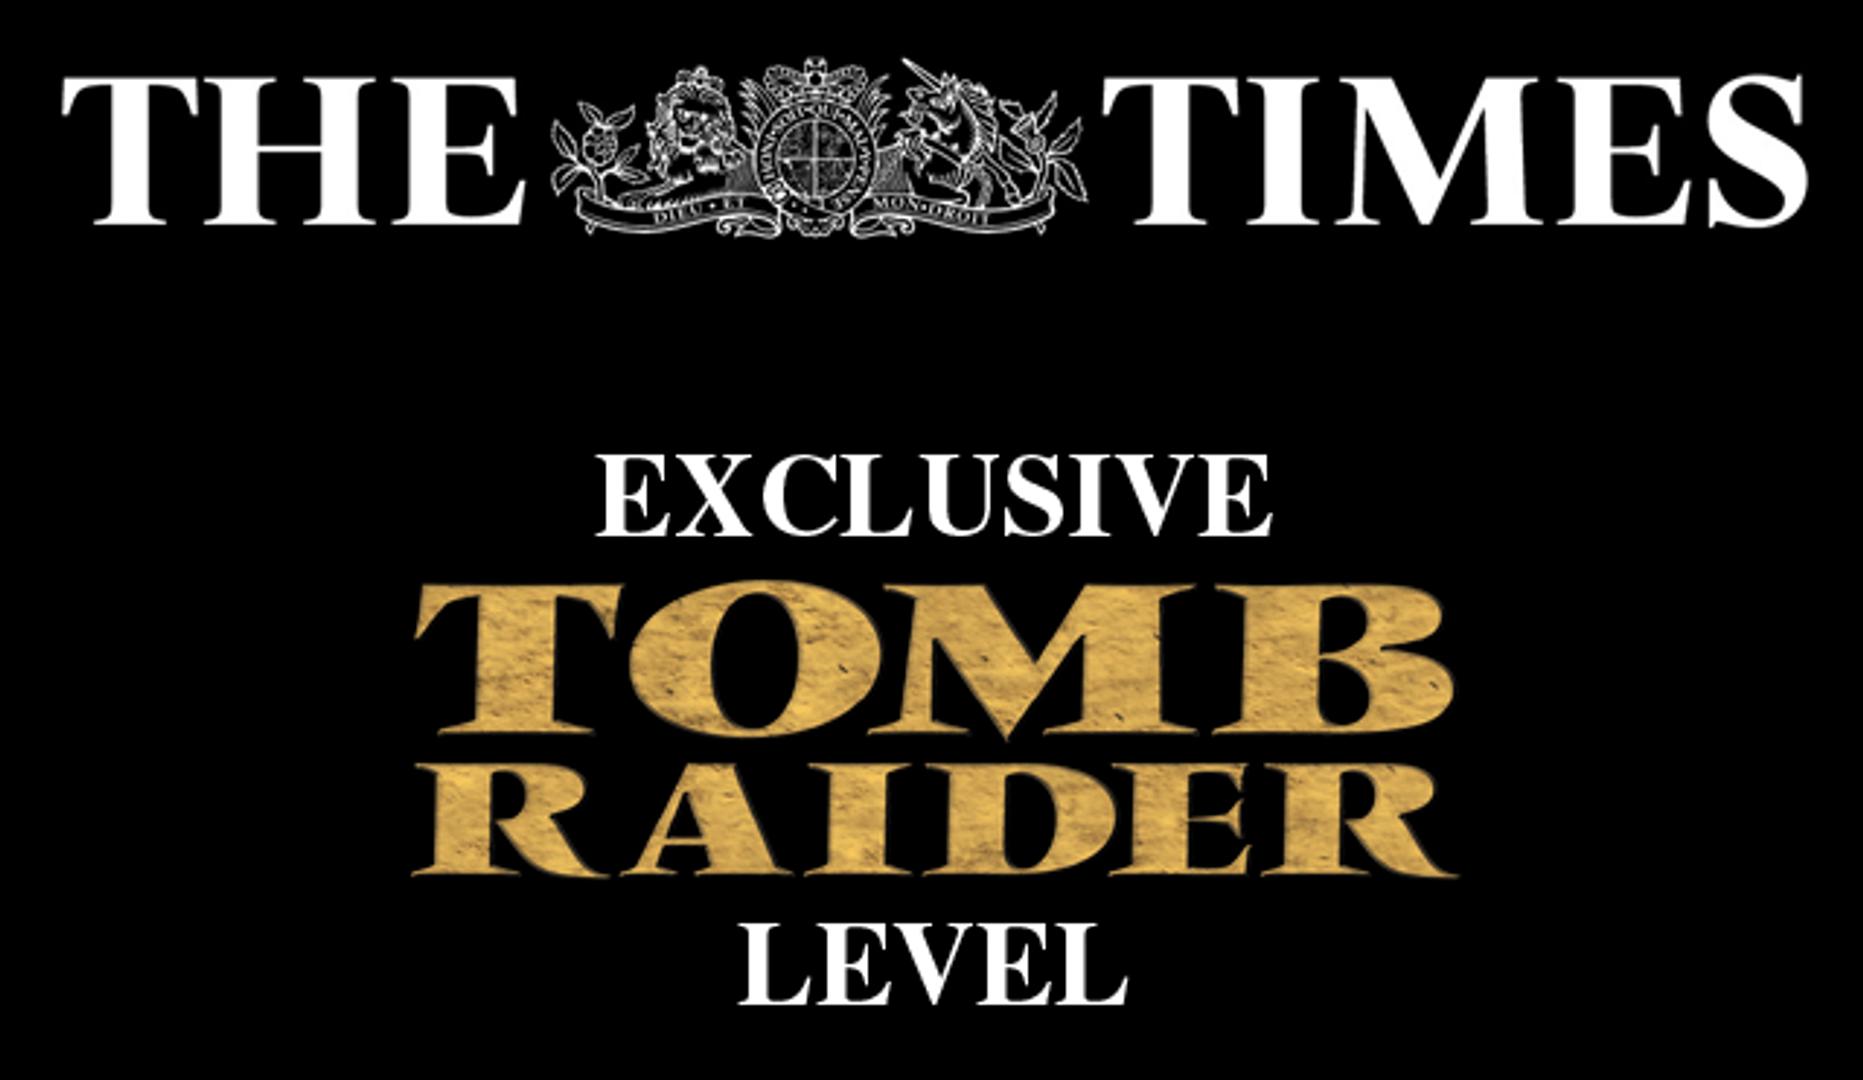 buy Tomb Raider: The Times cd key for all platform